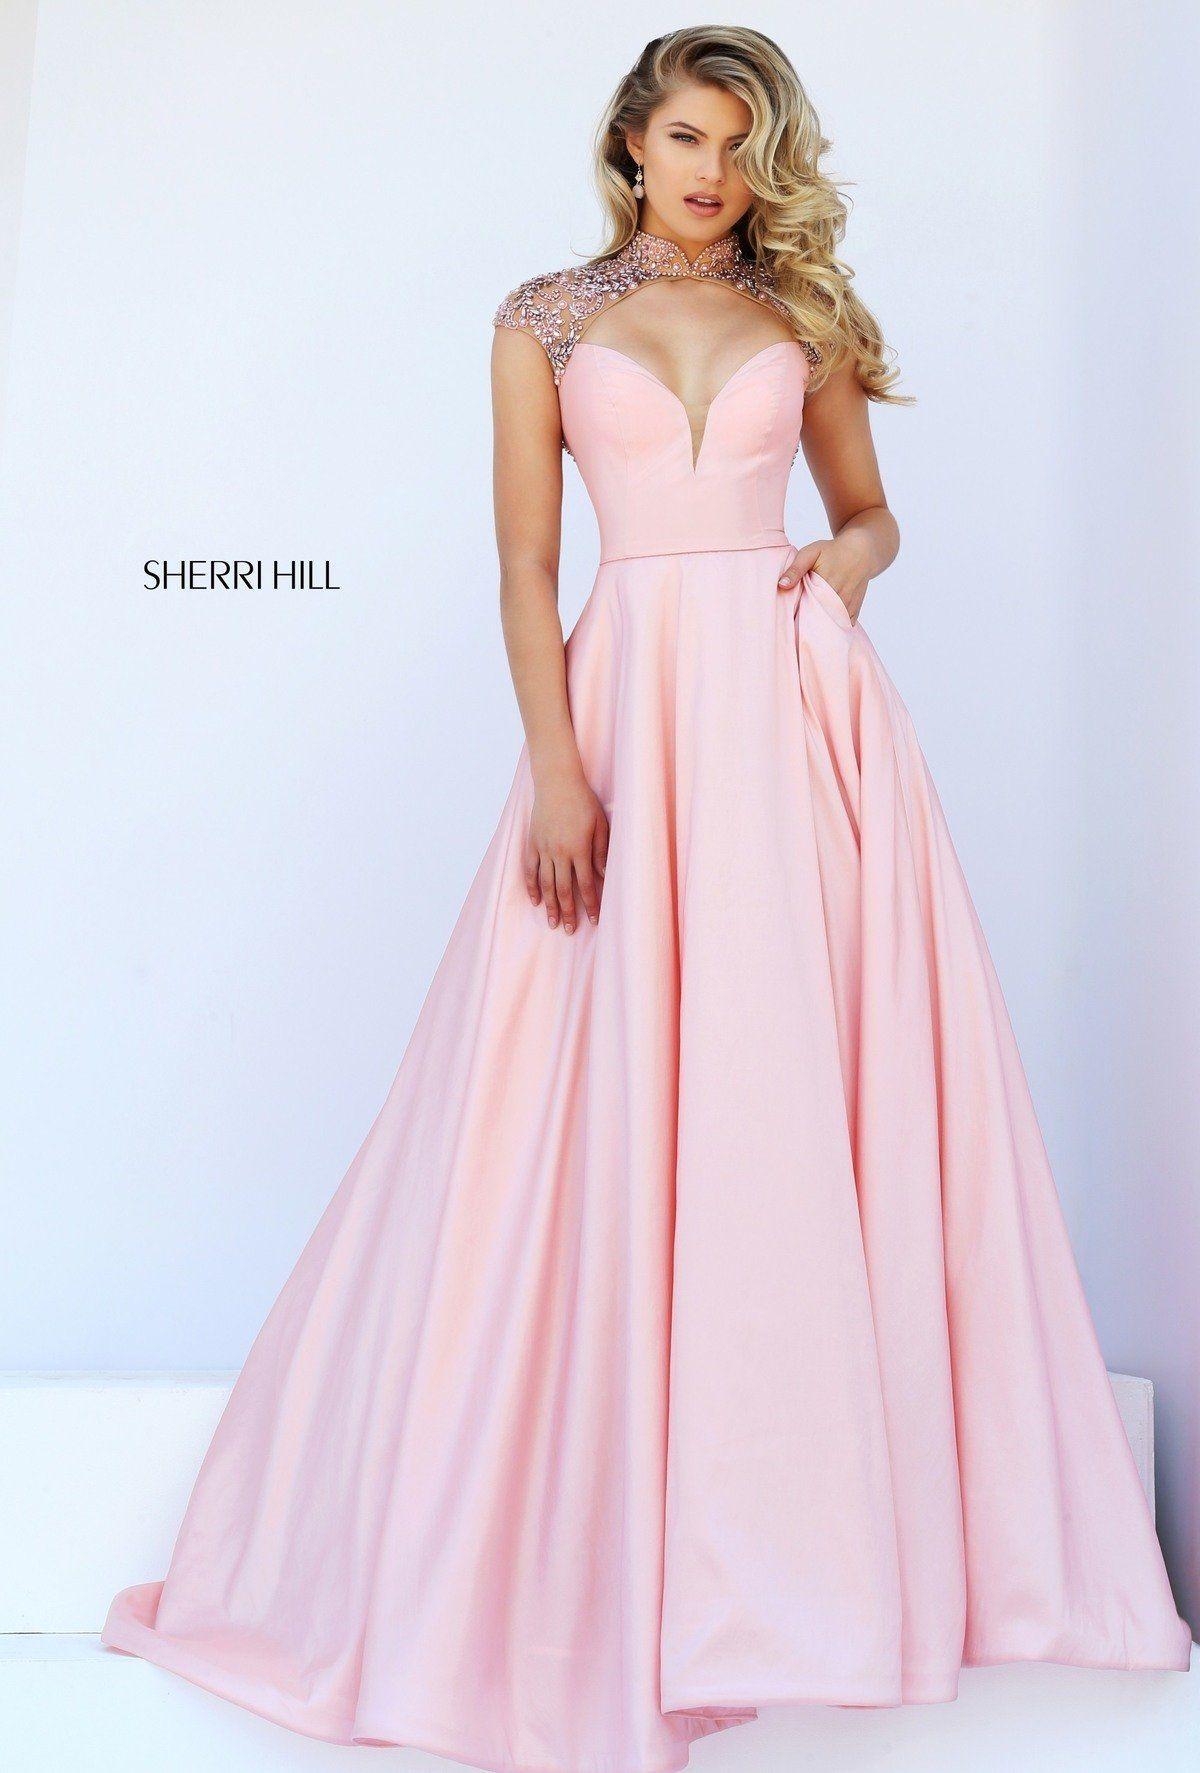 5a75c7bed2a103 Sherri Hill Style 50004. Sherri Hill Style 50004 Розовые Платья Для Выпускного  Вечера ...